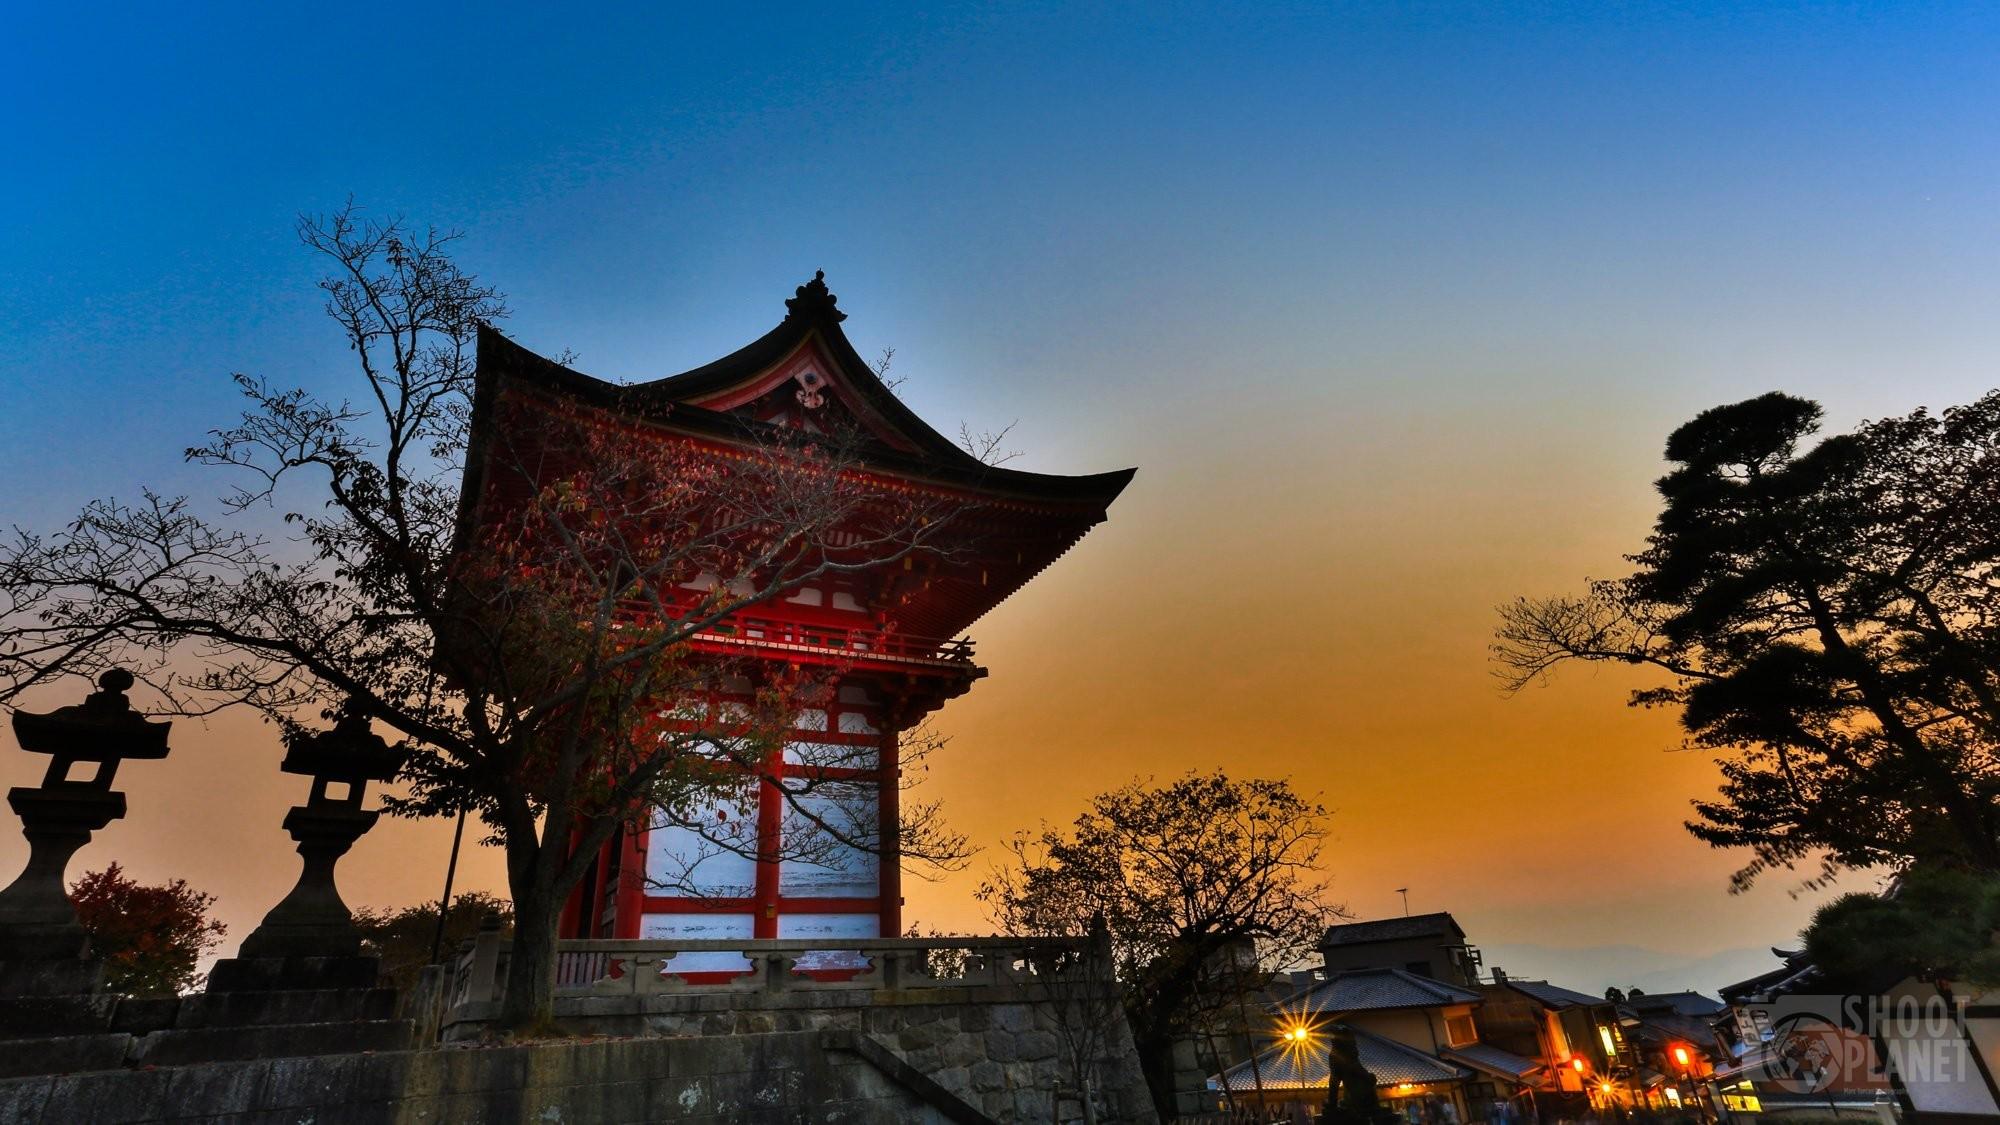 Kiyomizu-dera temple gate sunset in Kyoto